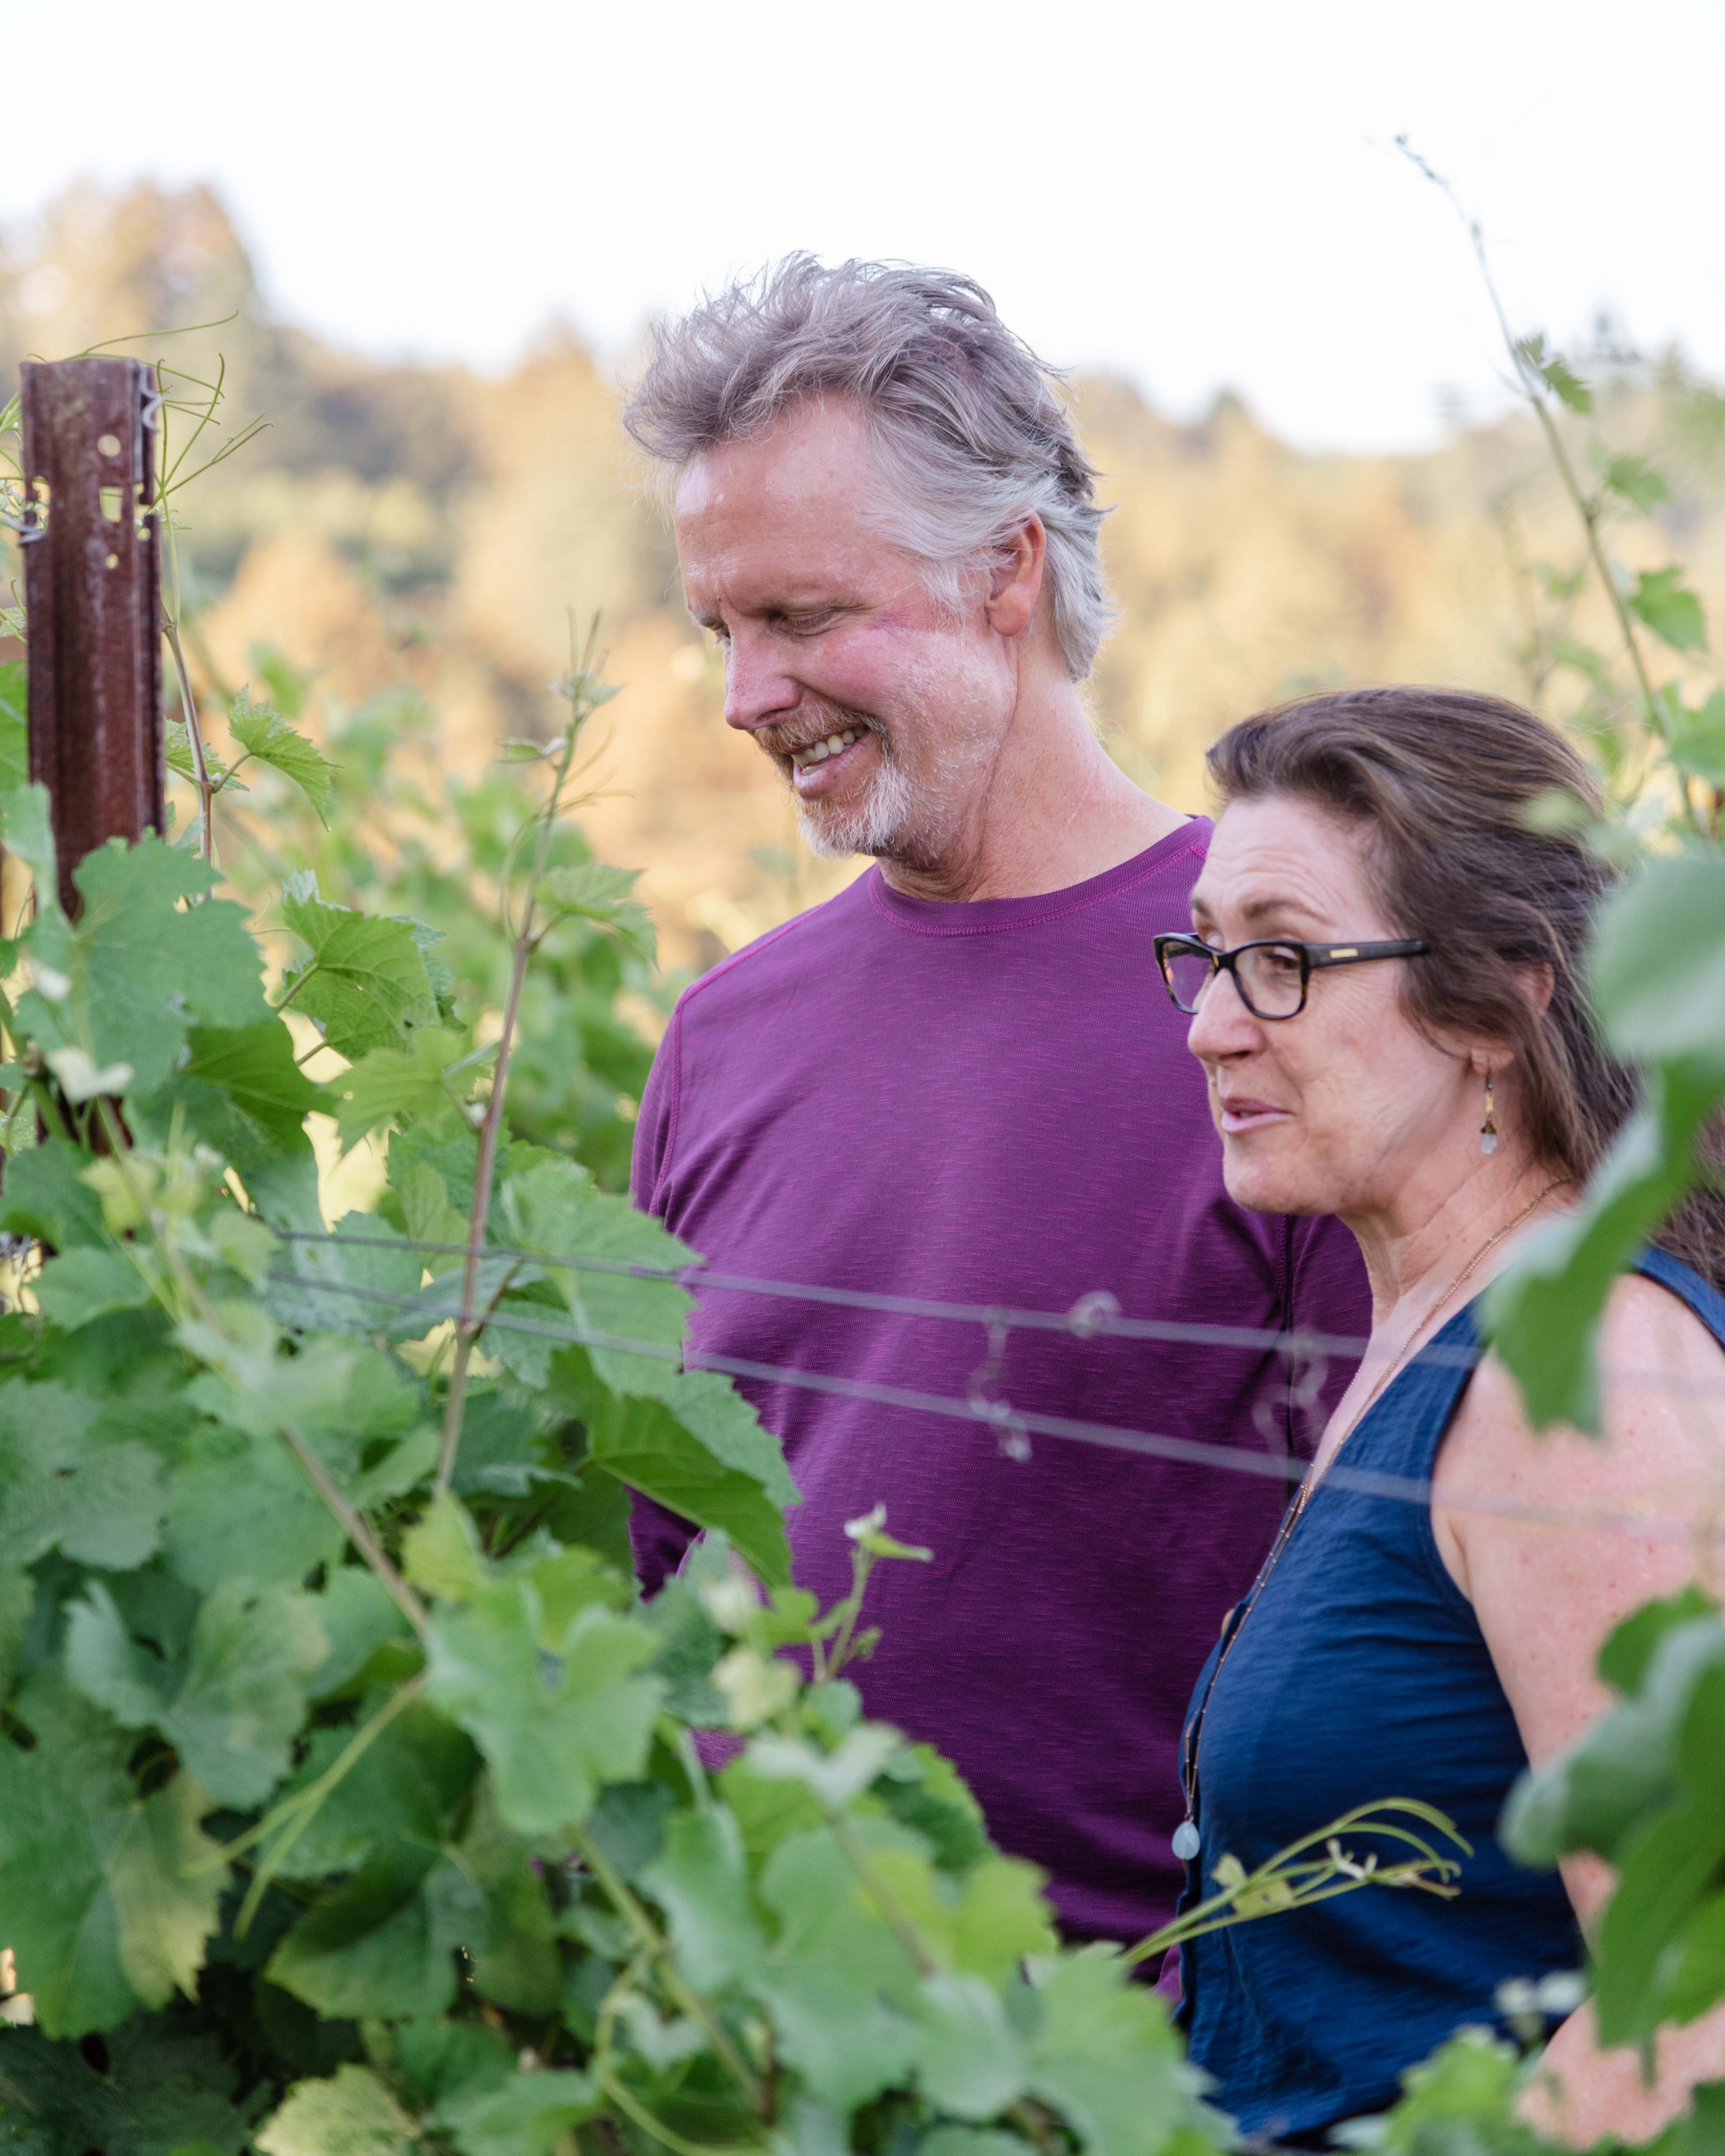 Chris Baker and Tina Cacace of Aptos Vineyard, inspecting some vines